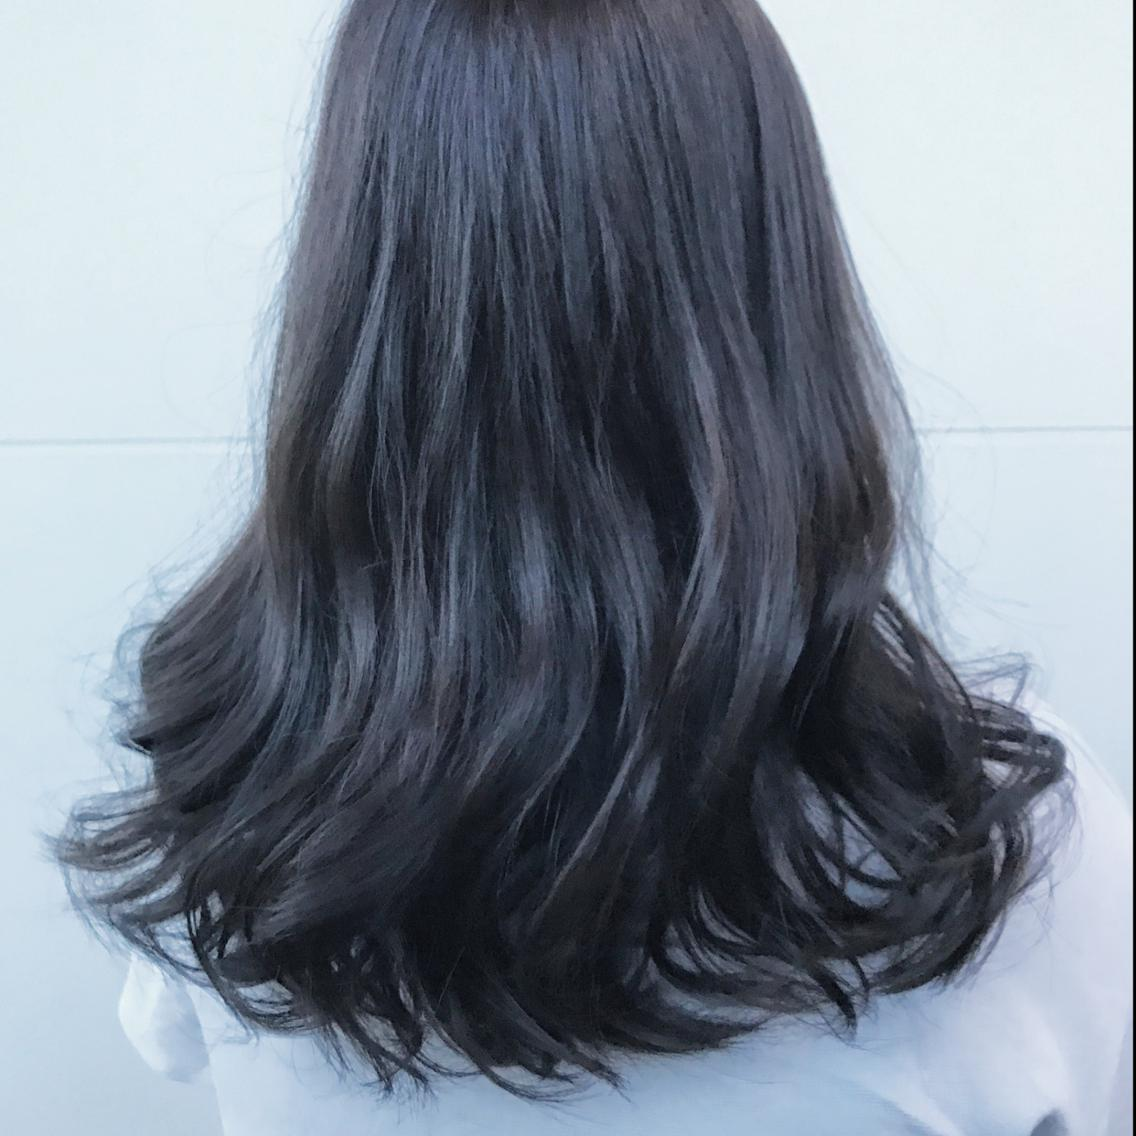 bloomhair→4/21(金)リニューアルオープン✨髪のお悩み何でもお話し下さい♡一緒に考えて、最良の解決方法を導き出します♡お悩み解決カット✂︎...リラックスできる空間を♡